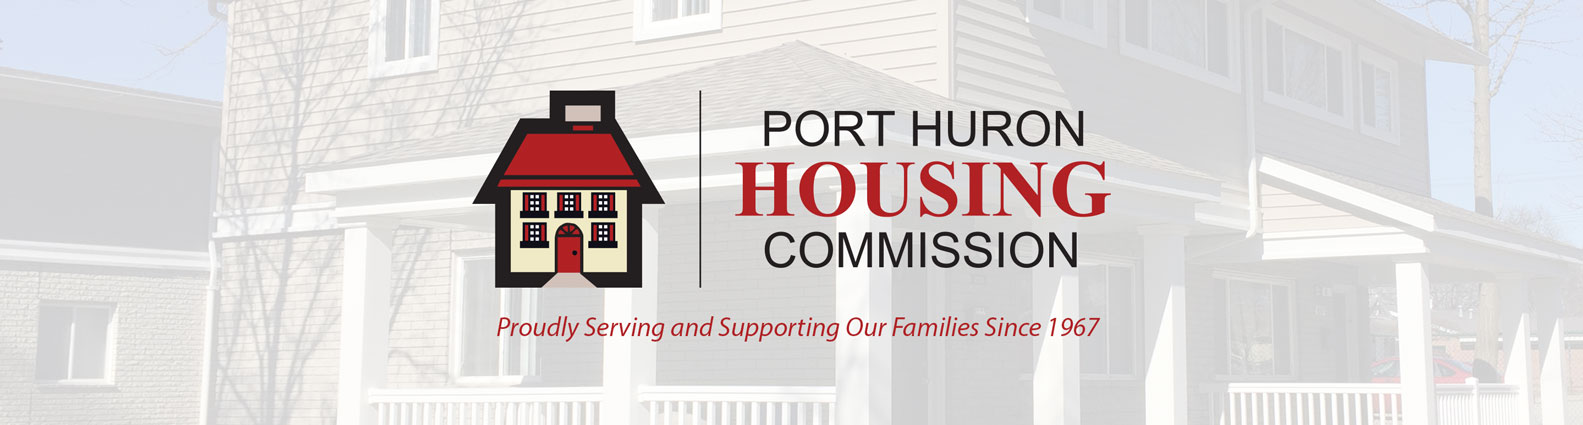 Port Huron Housing Commission Logo Banner